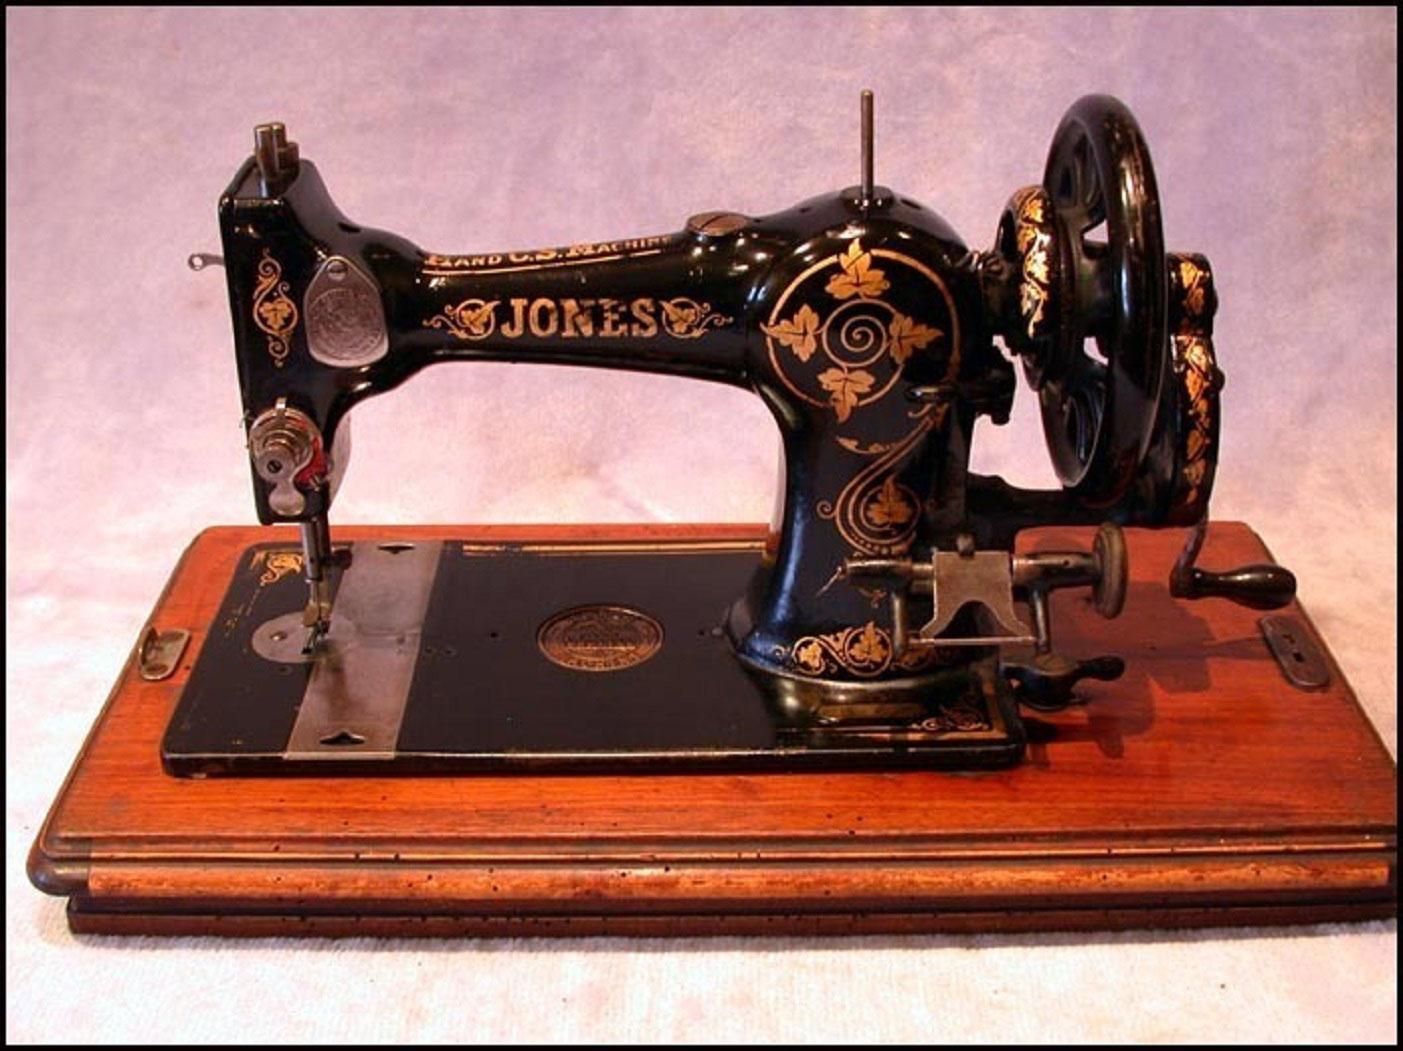 Jones Family Cs Machines Part 1